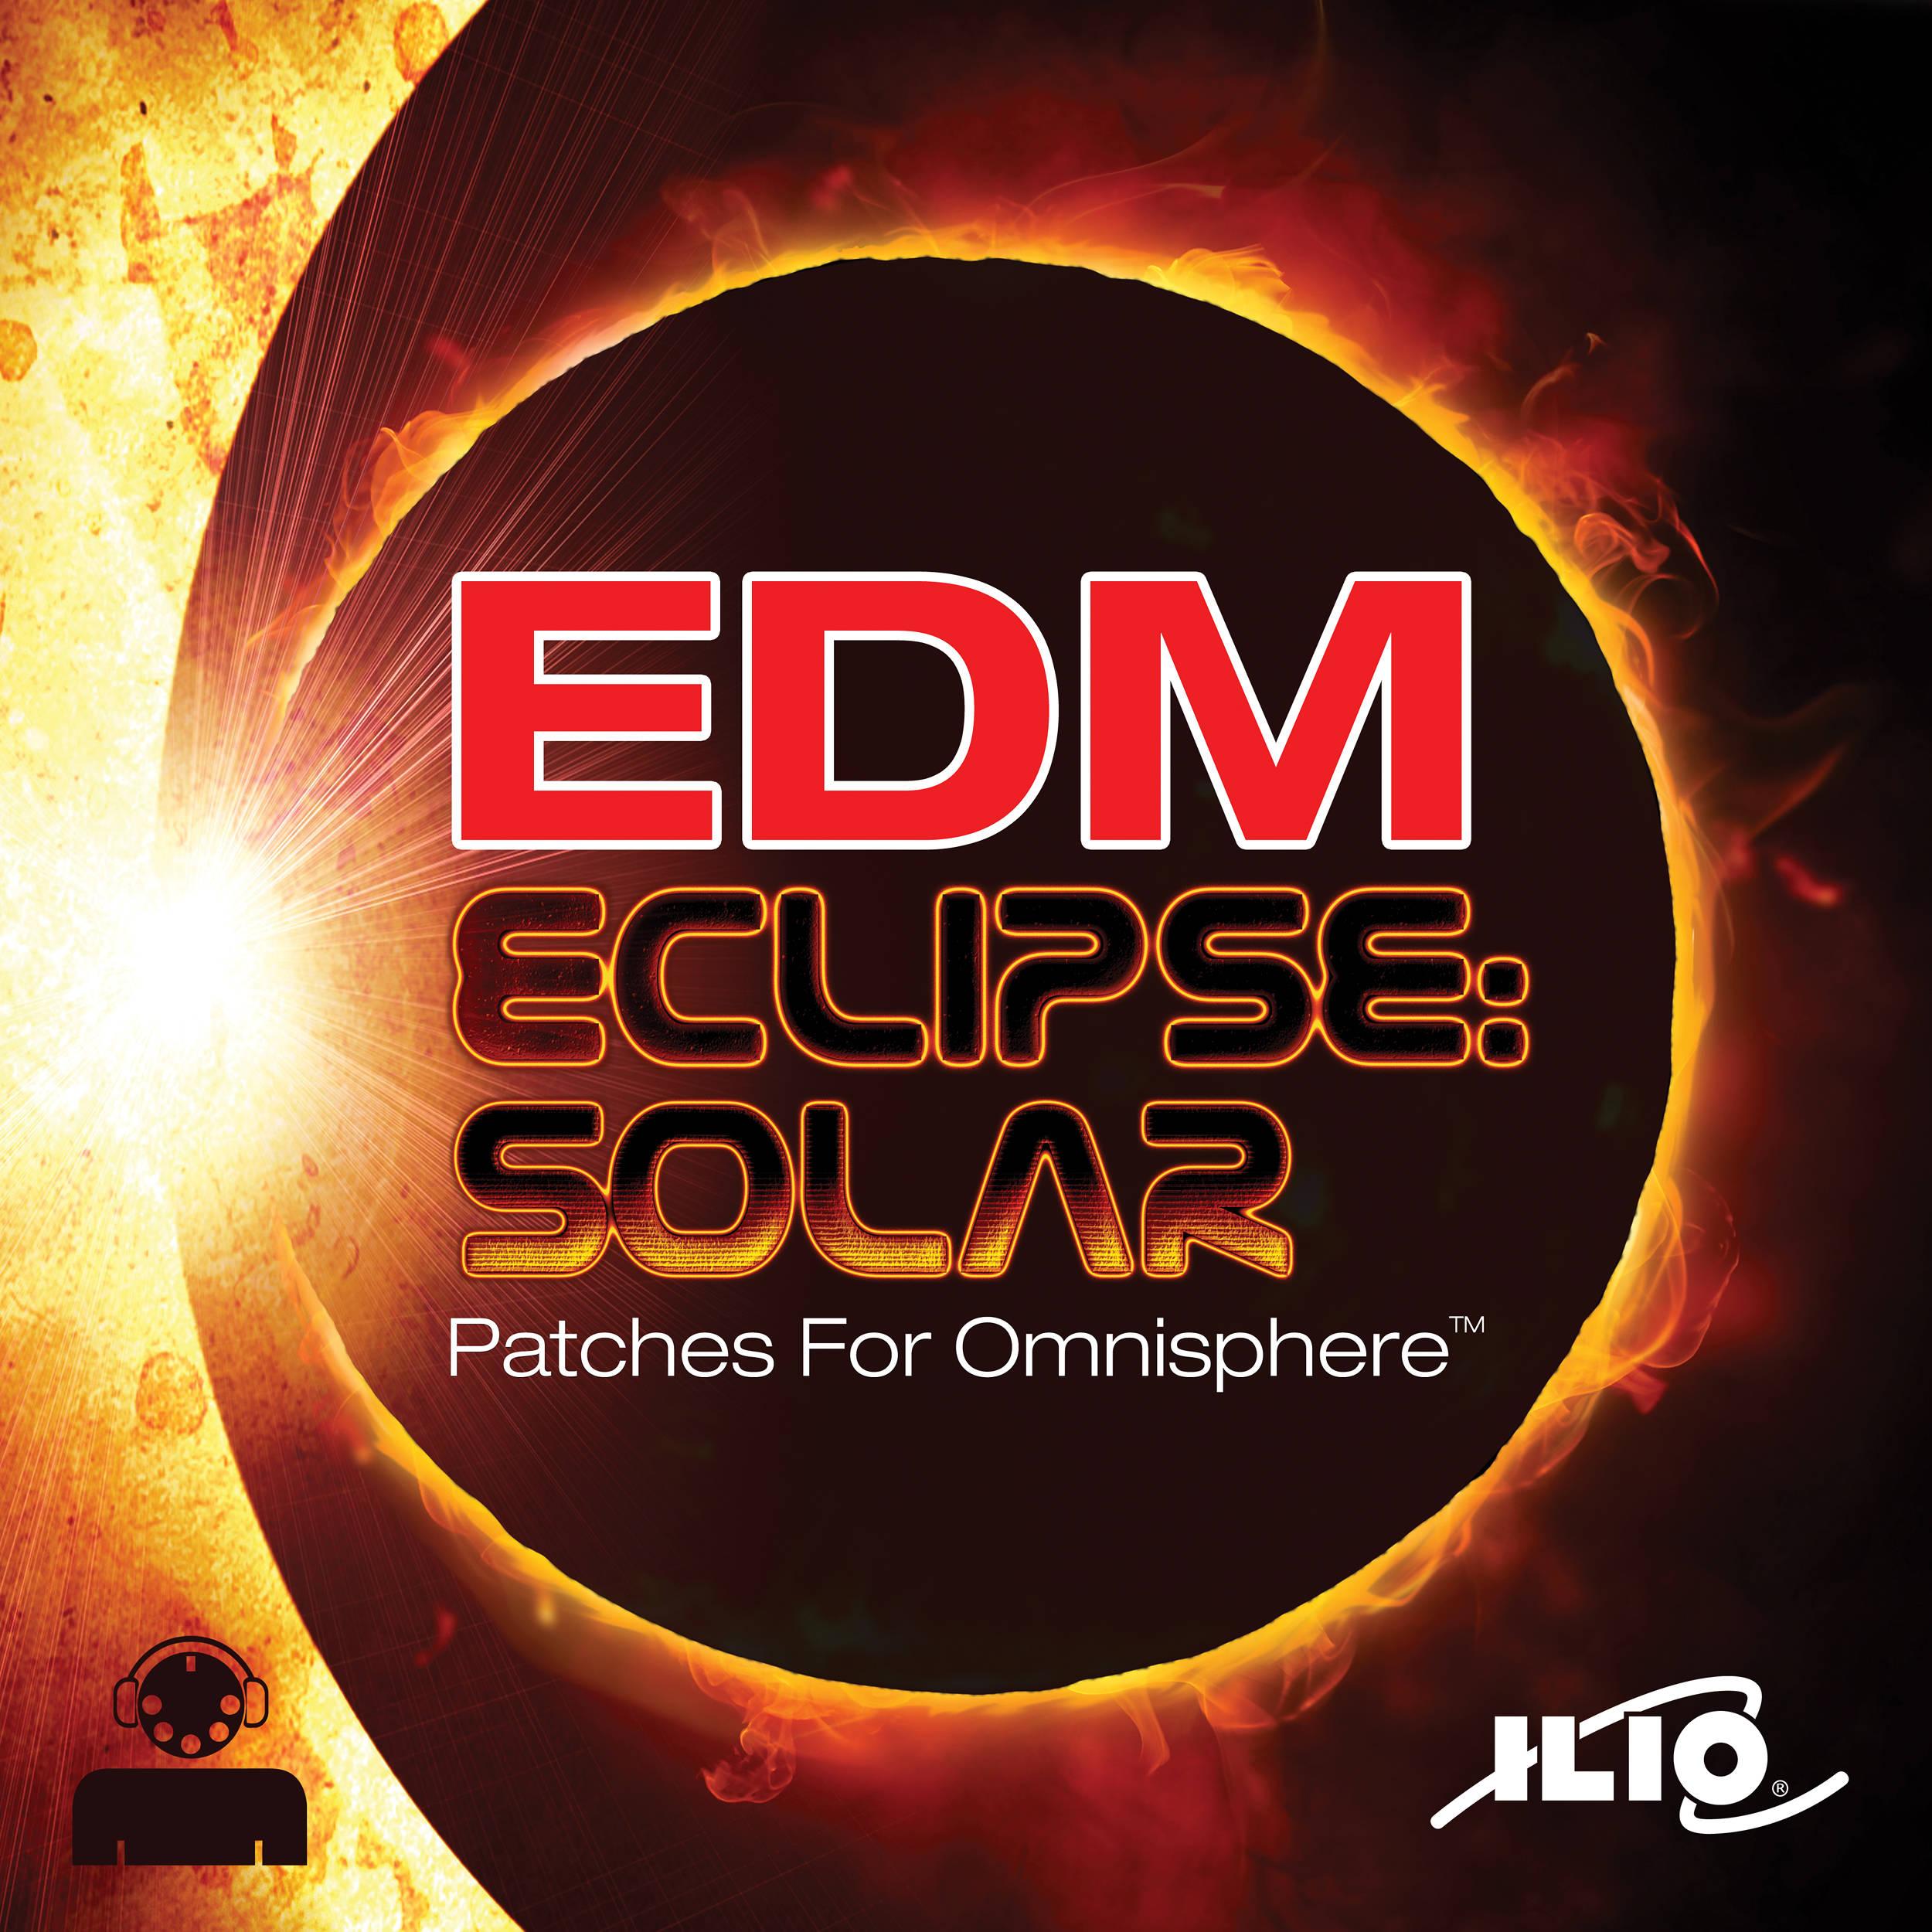 ILIO EDM Eclipse: Solar - Patches for Omnisphere (Download)